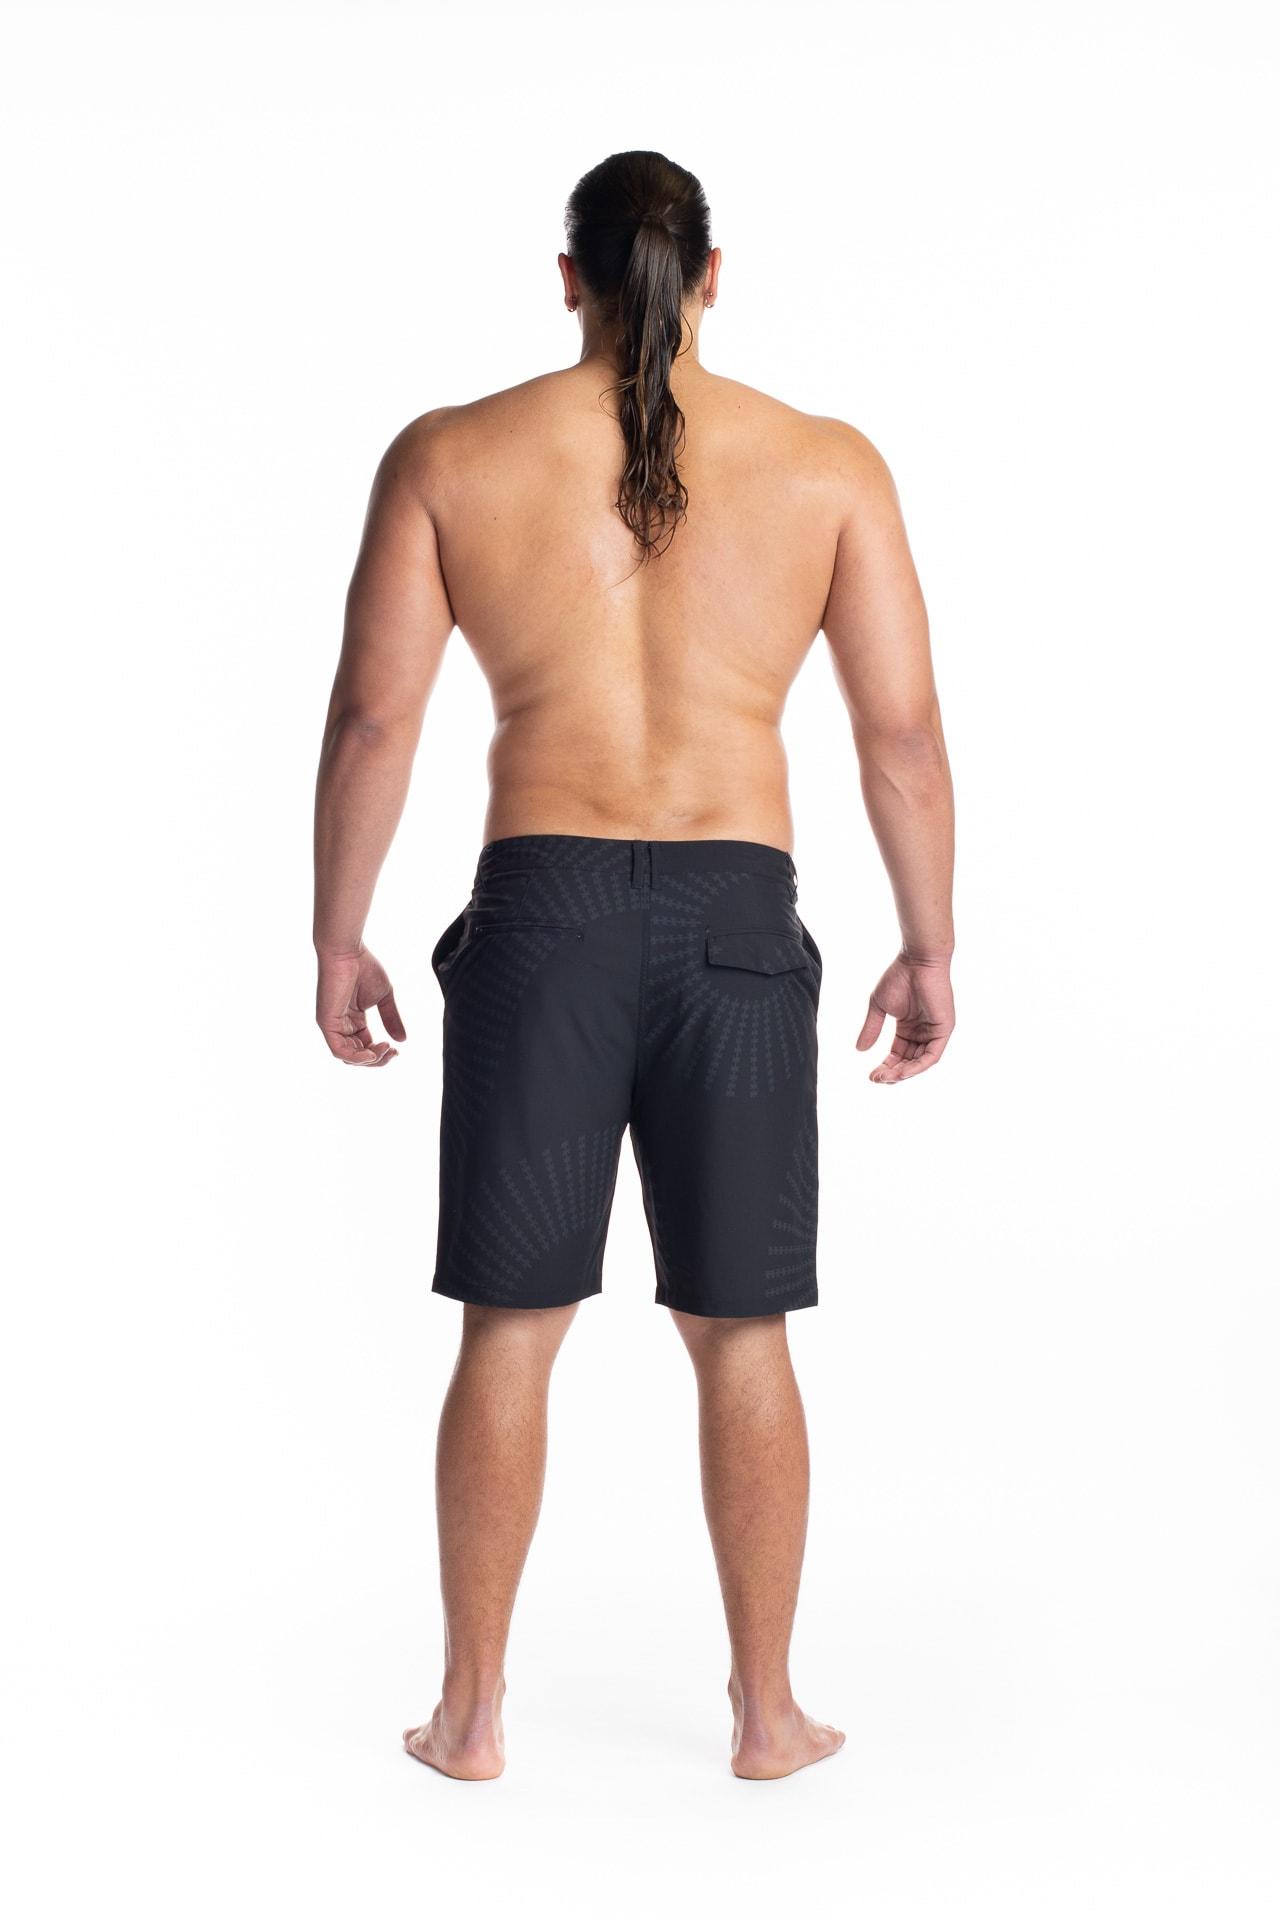 Male model wearing 4 Way Stretch in Black Pewa - Back View